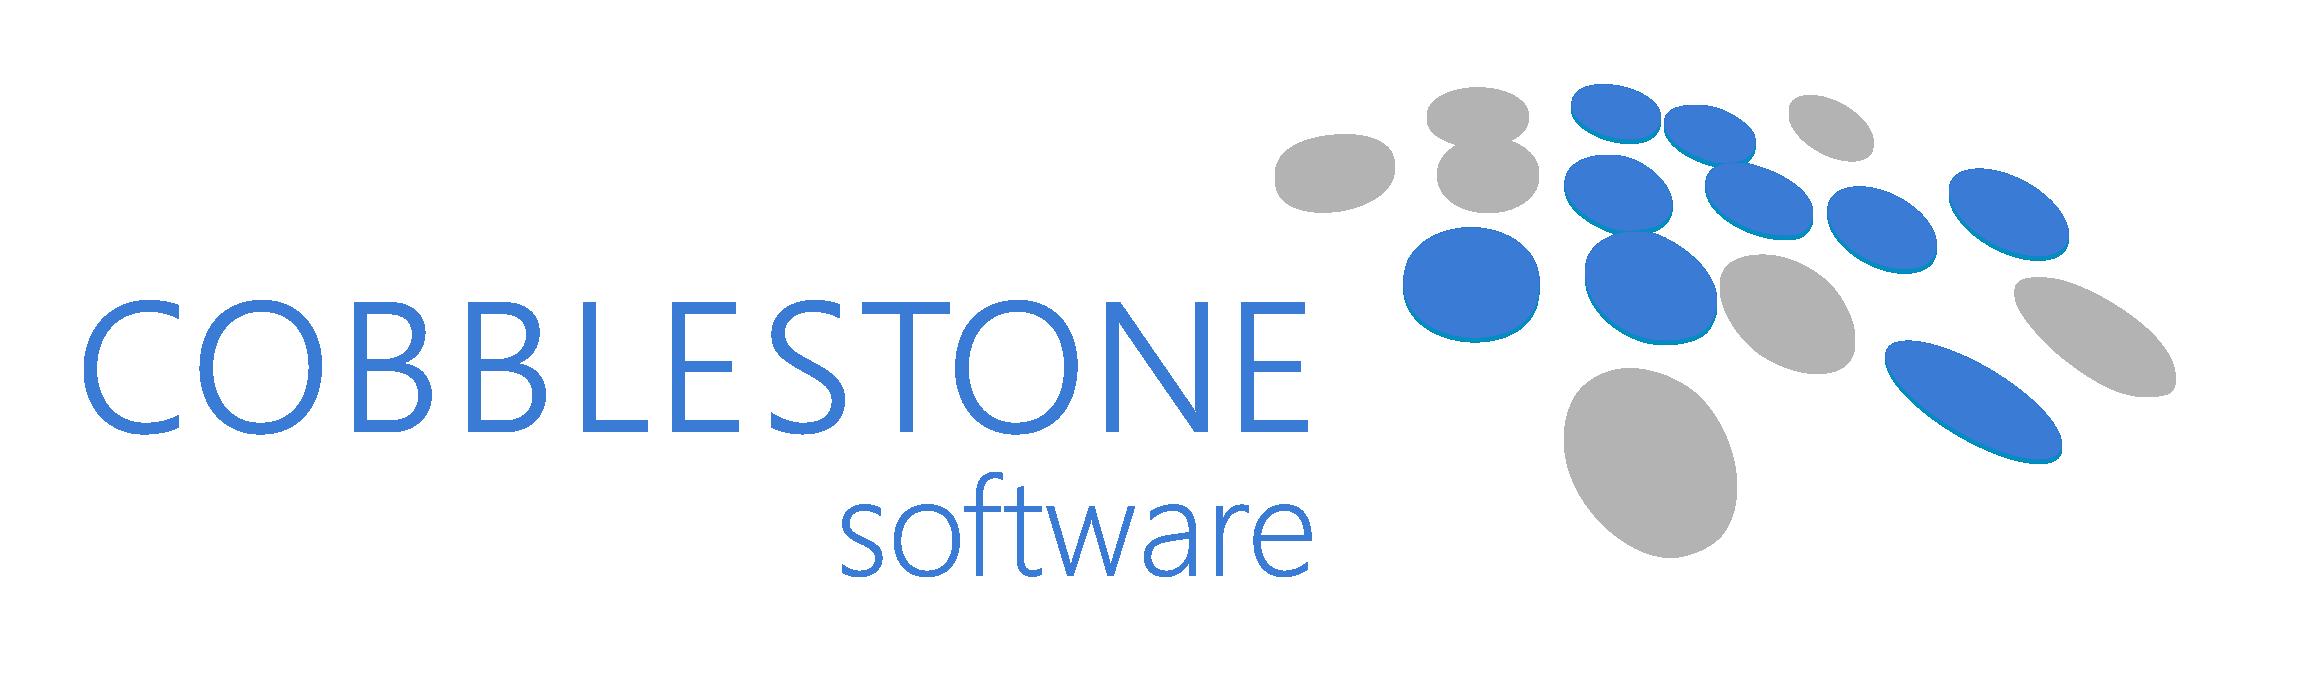 CobbleStone Software CLM Logo Aqua Grey